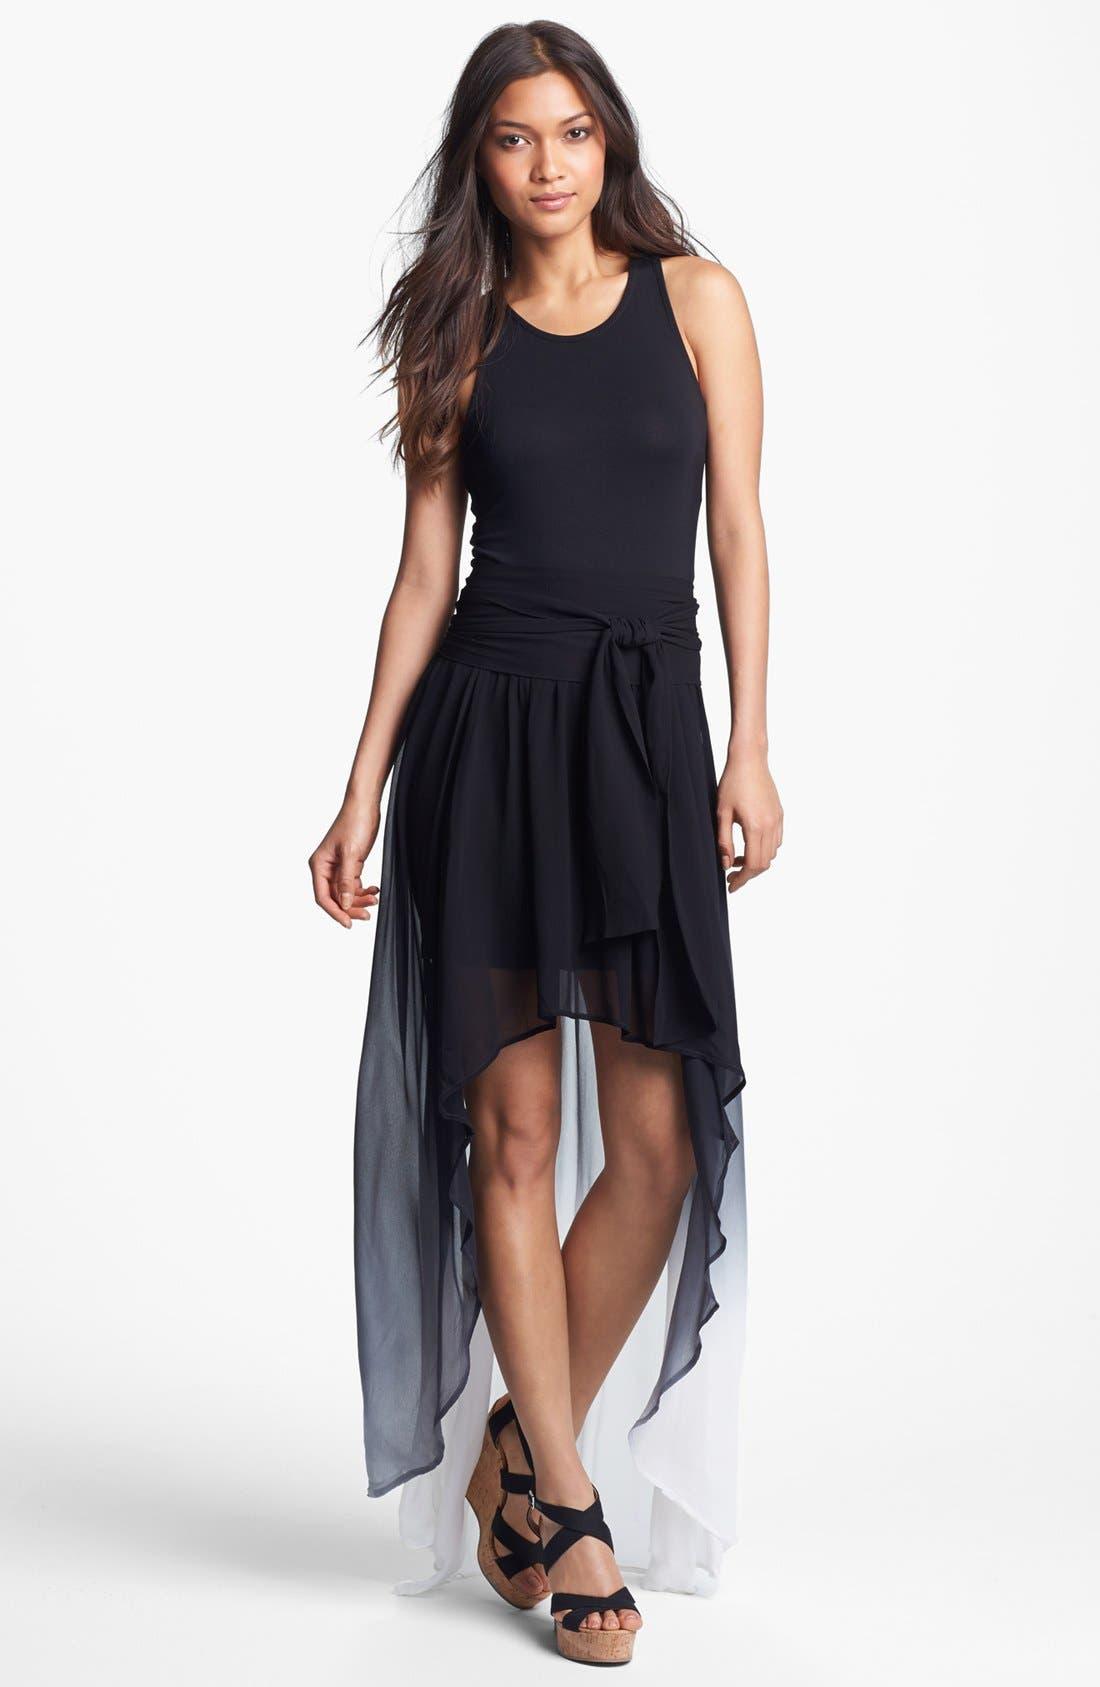 Main Image - Young, Fabulous & Broke 'Kula' Ombré Maxi Dress